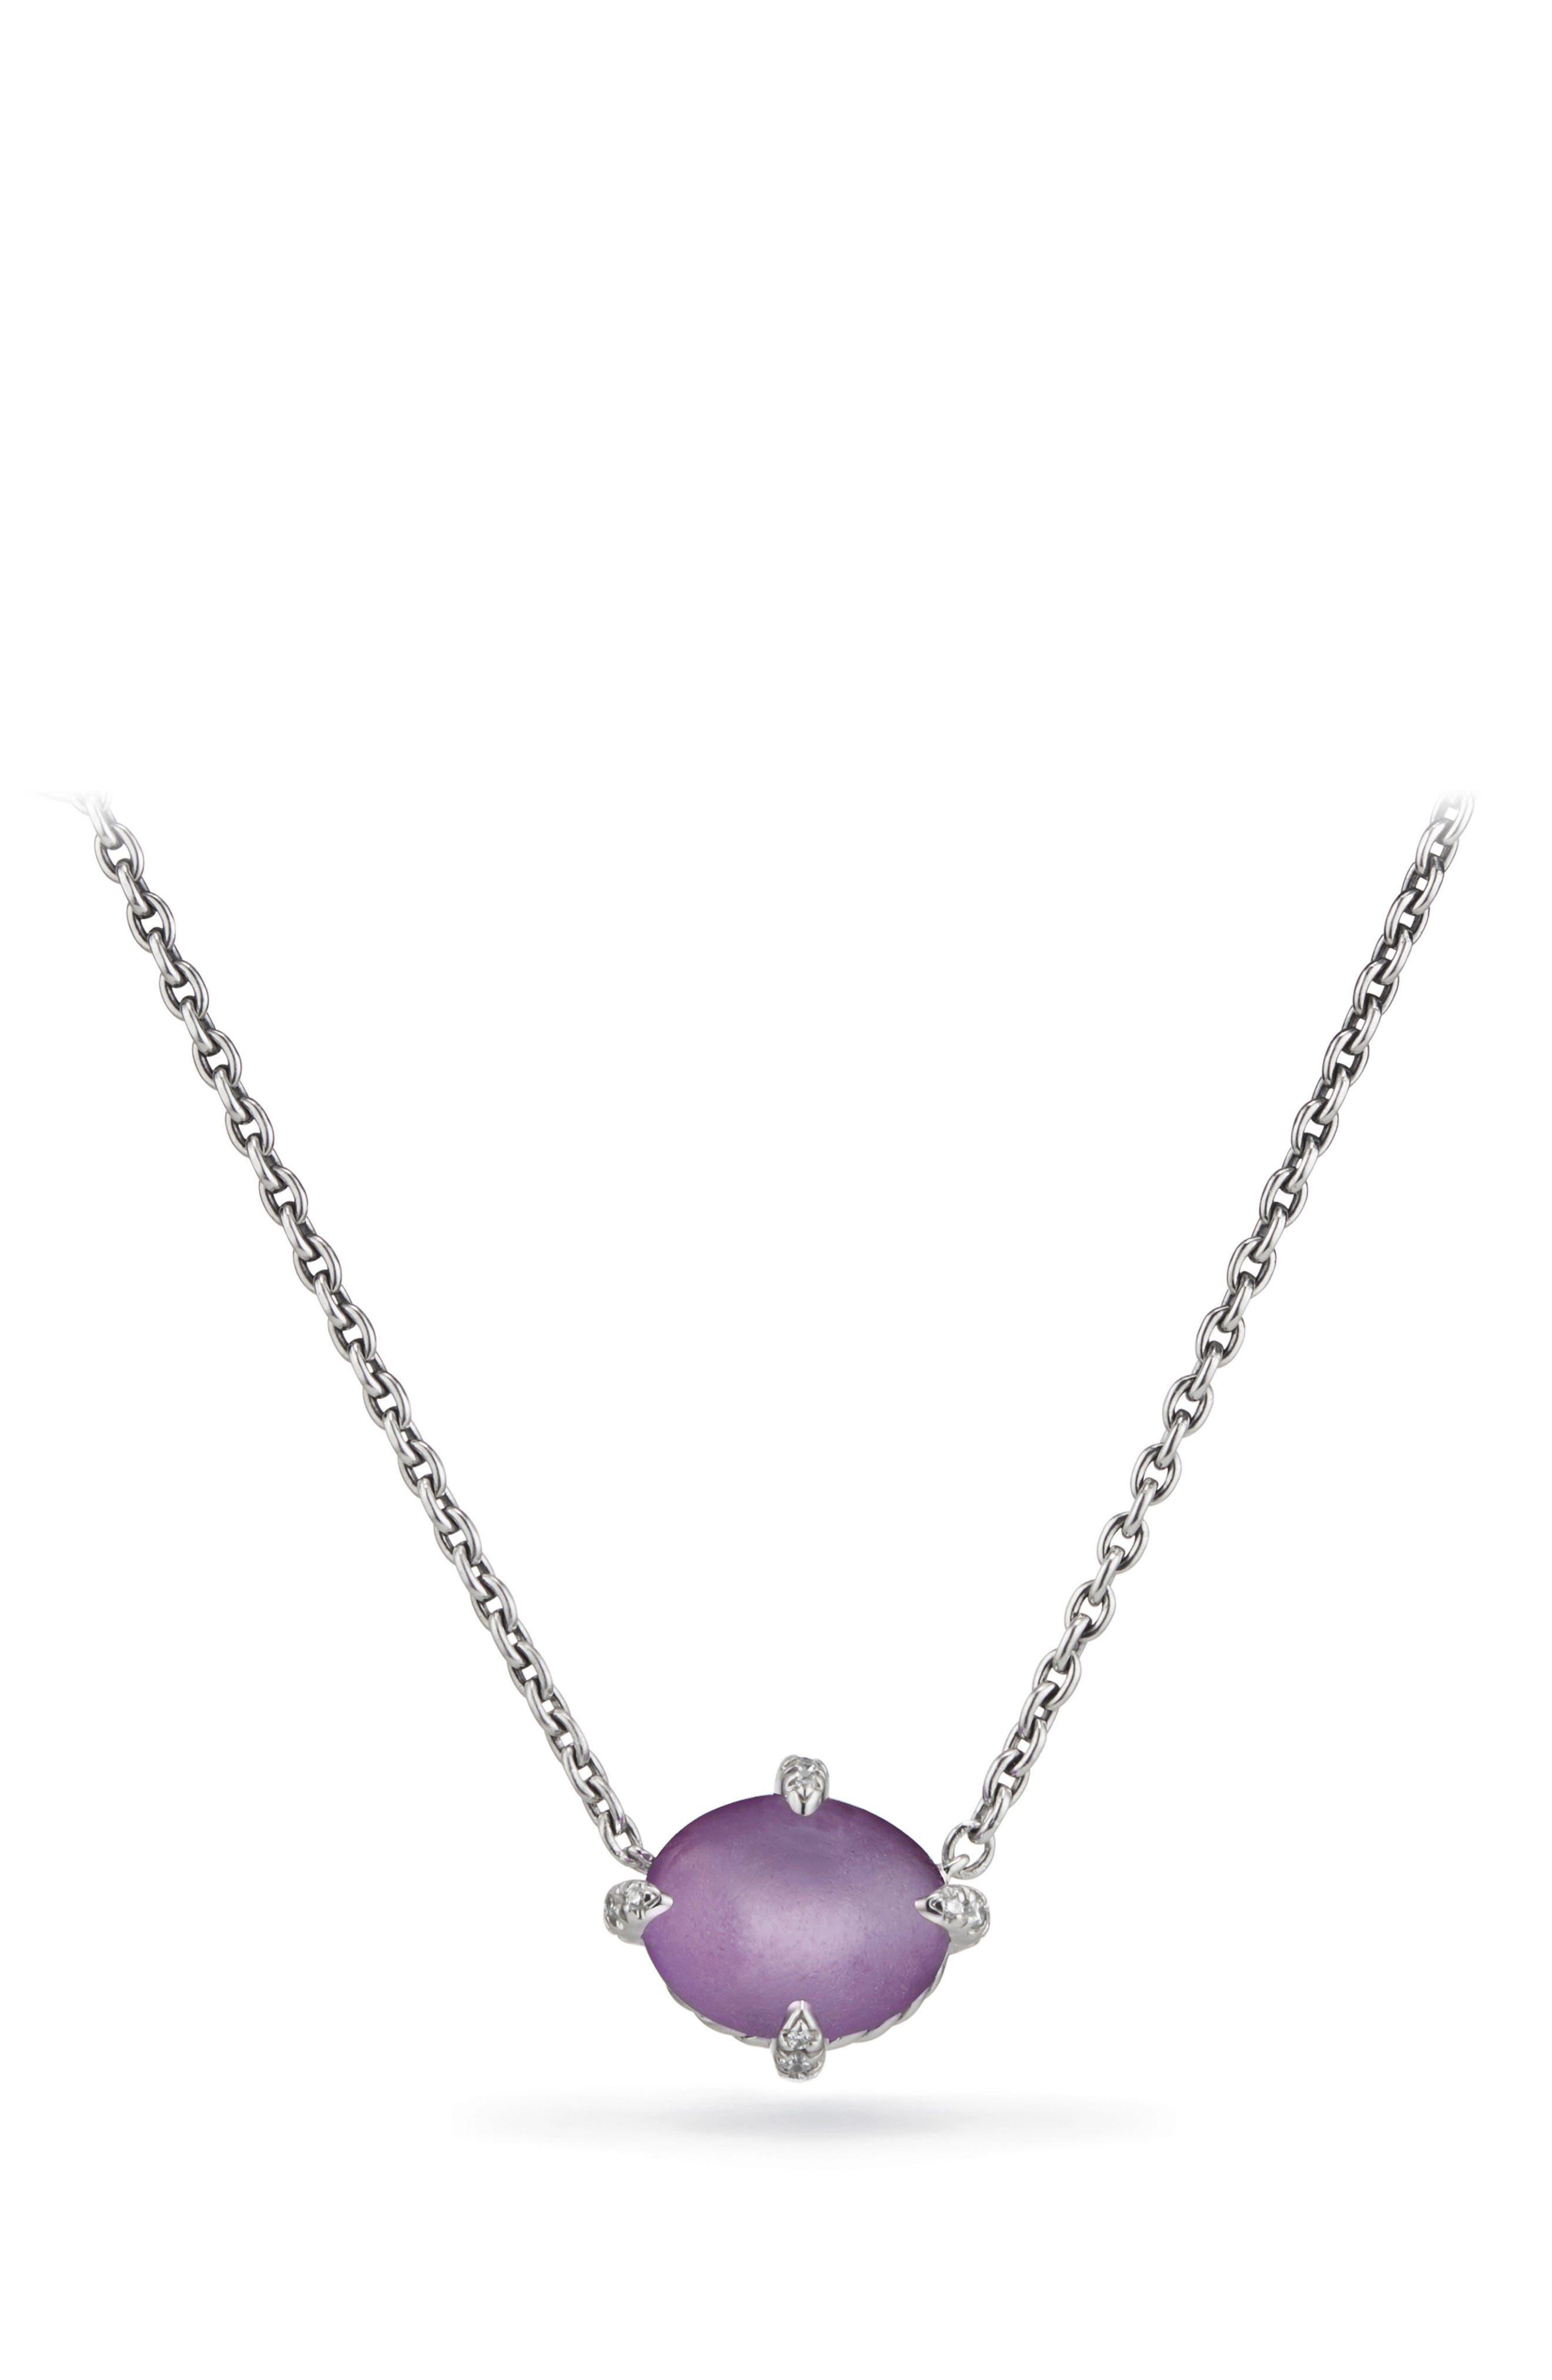 Chatelaine<sup>®</sup> Gemstone & Diamond Necklace,                             Main thumbnail 1, color,                             SILVER/ DIAMOND/ AMETHYST